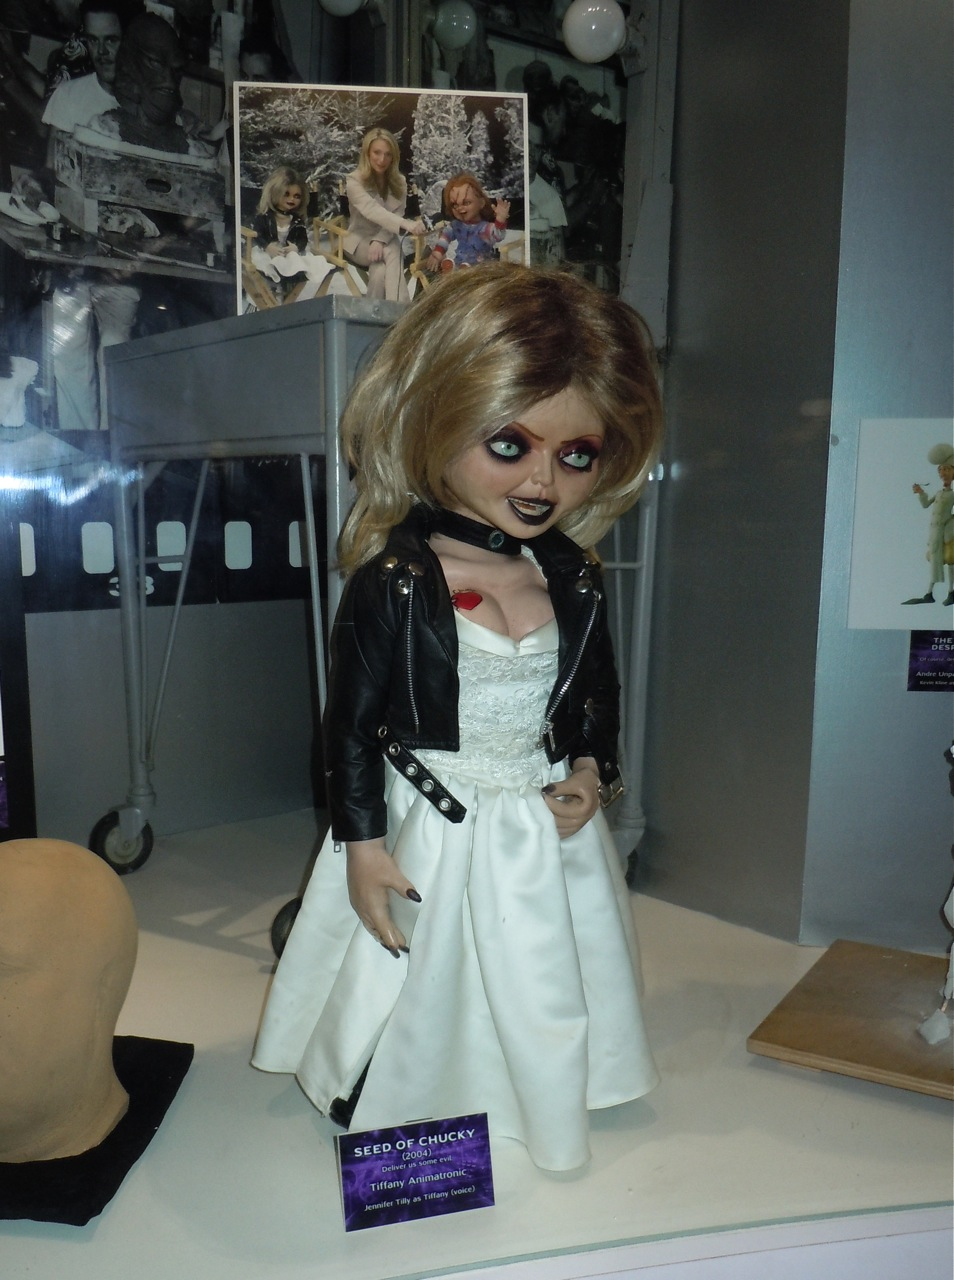 http://2.bp.blogspot.com/_GIchwvJ-aNk/TCOgS8P5kWI/AAAAAAAASMs/ceF9woQbu5s/s1600/Seed+of+Chucky+Tiffany+animatronic.jpg